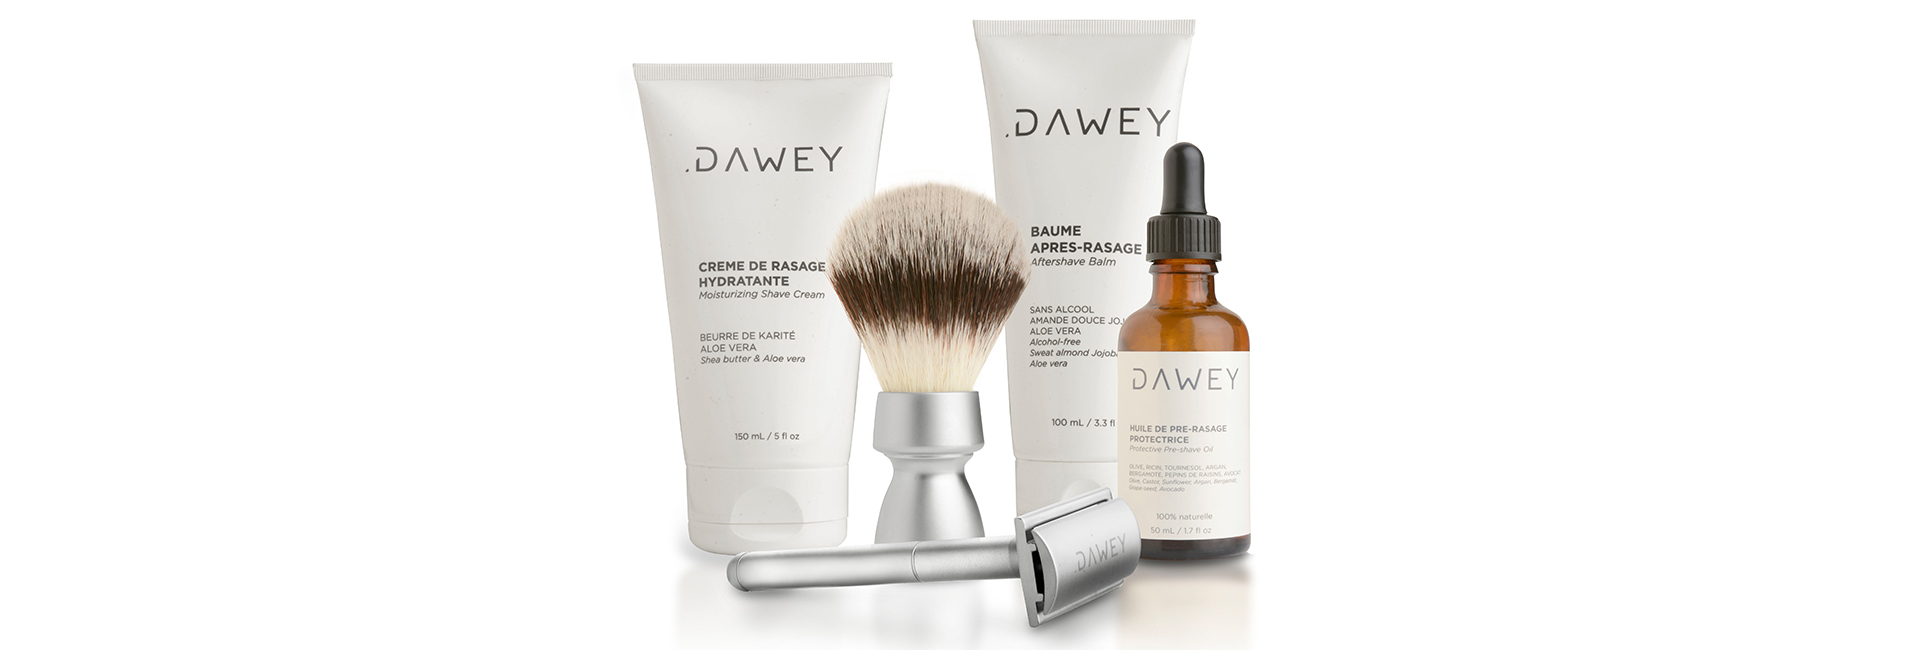 rituel-de-rasage-dawey-blog-beaute-soin-parfum-homme